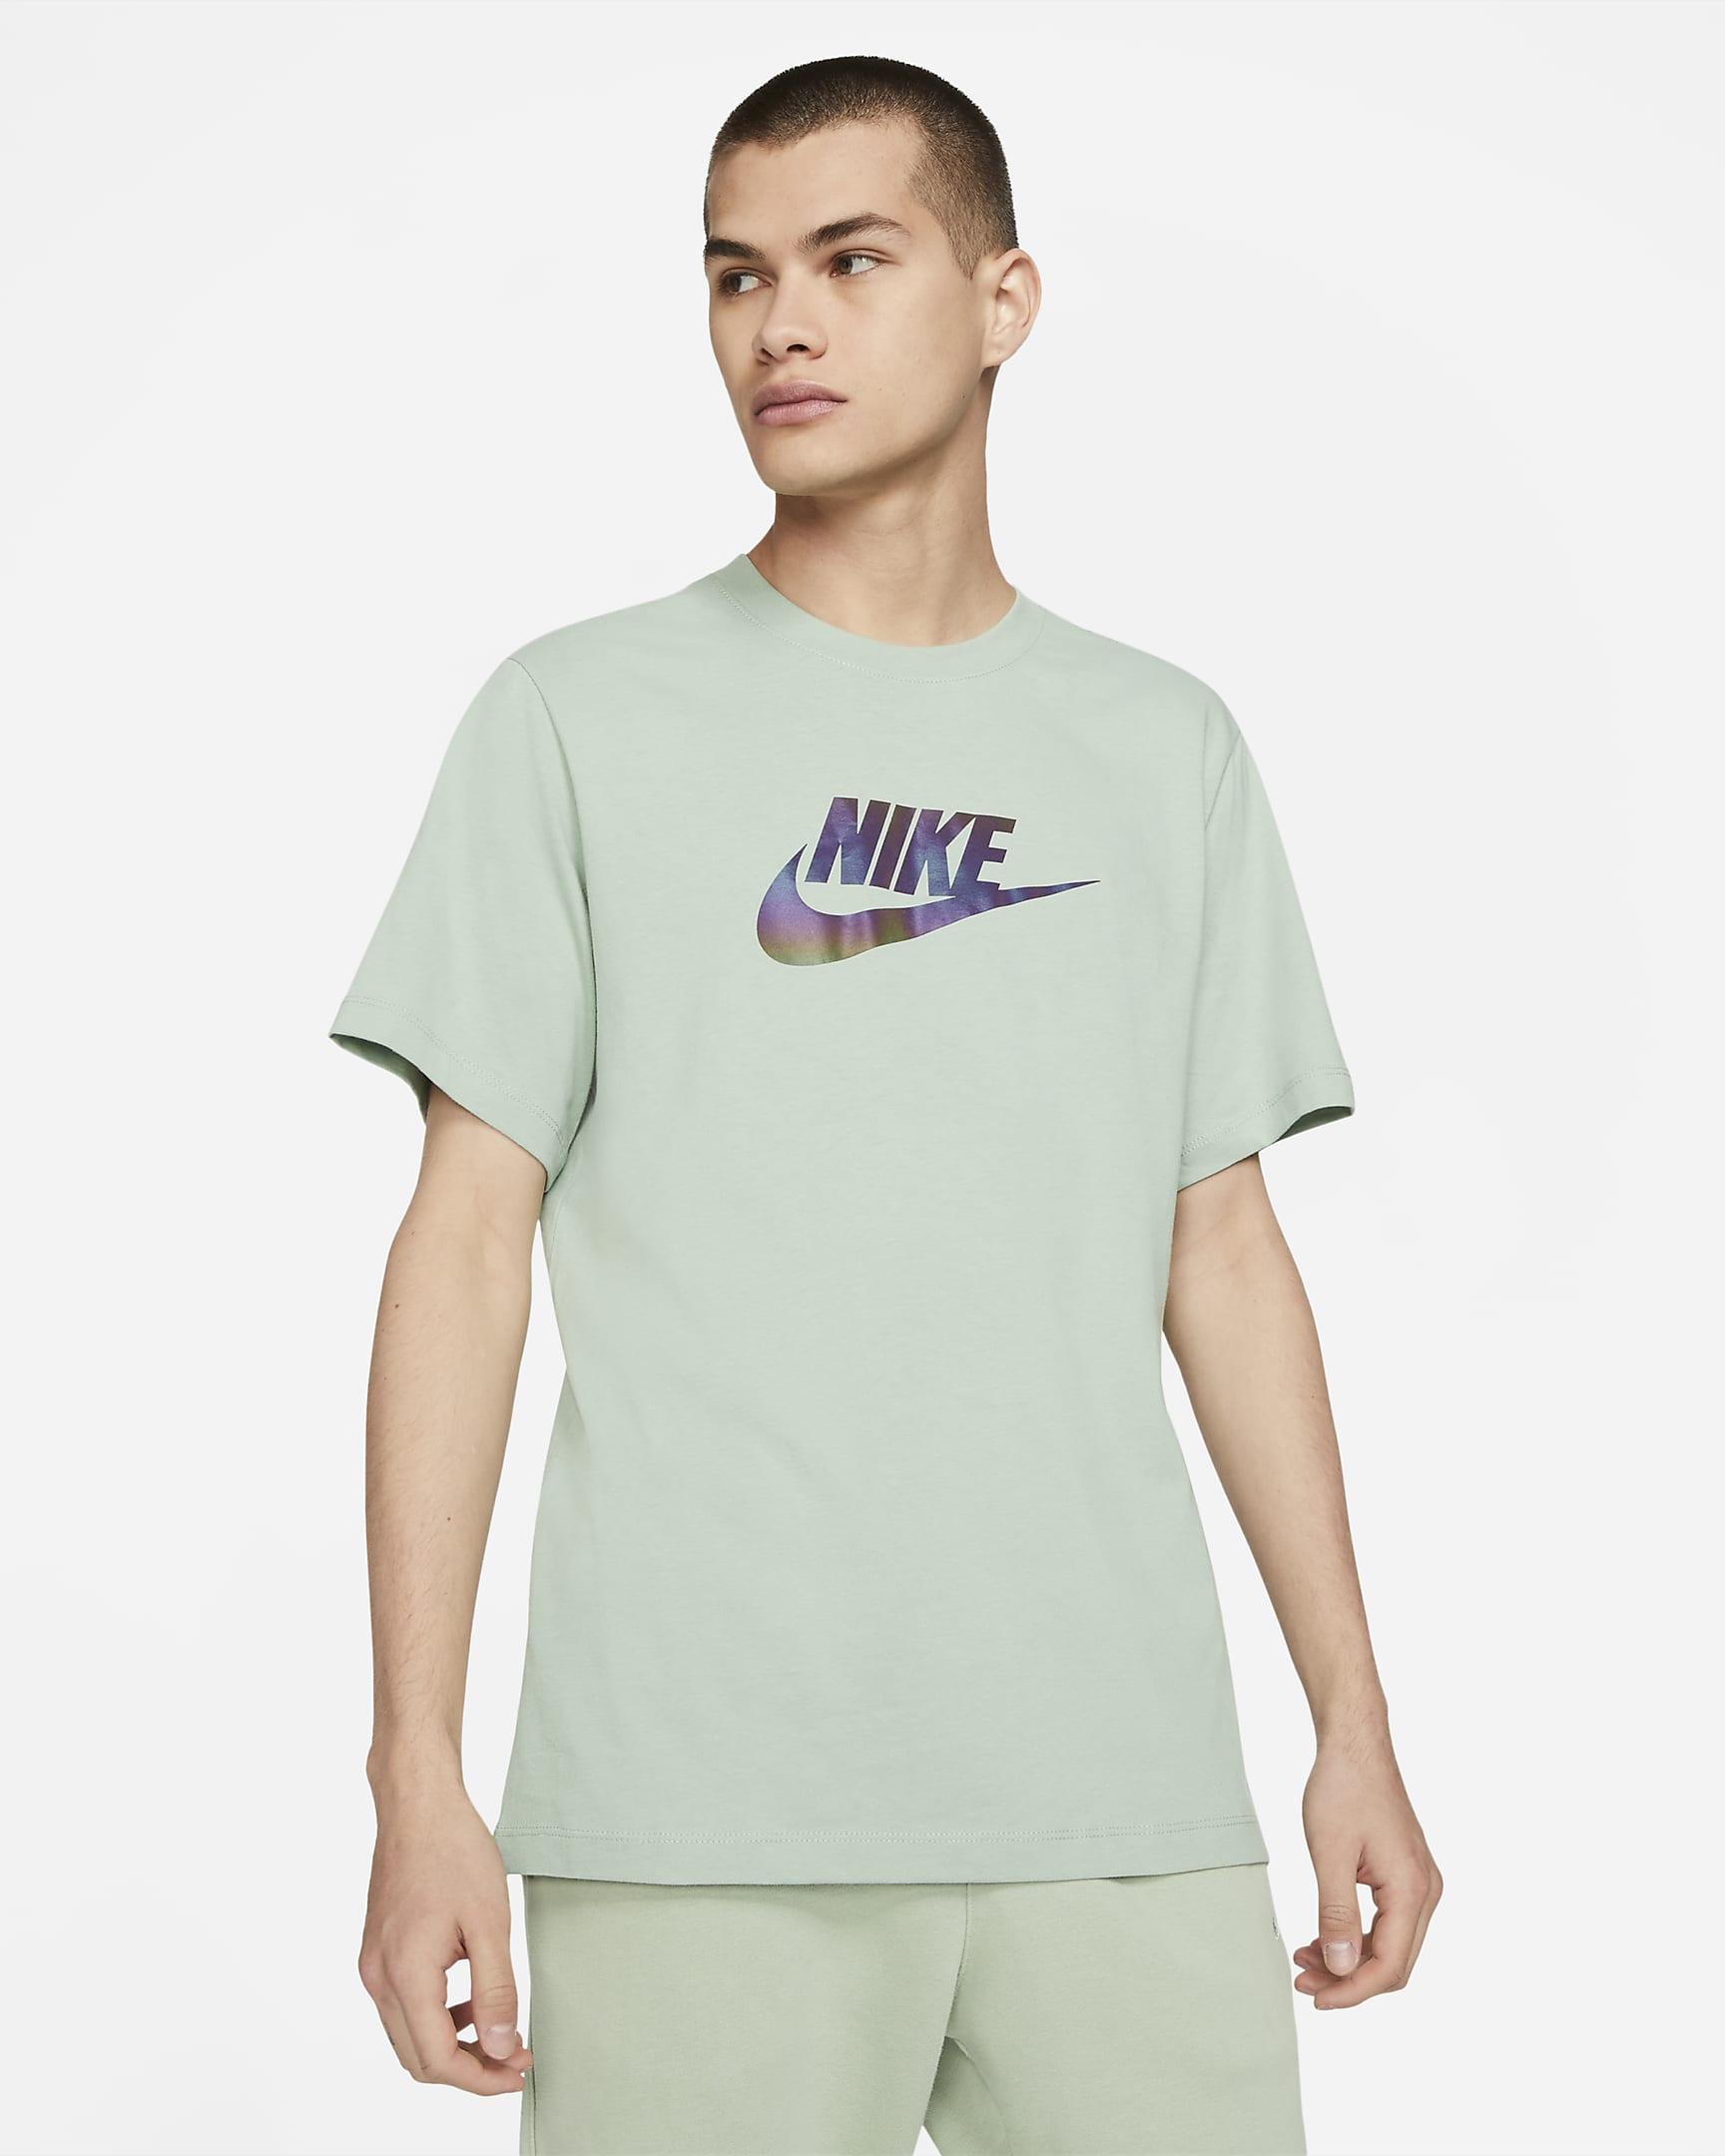 nike-sportswear-mens-t-shirt-50pRvS.png